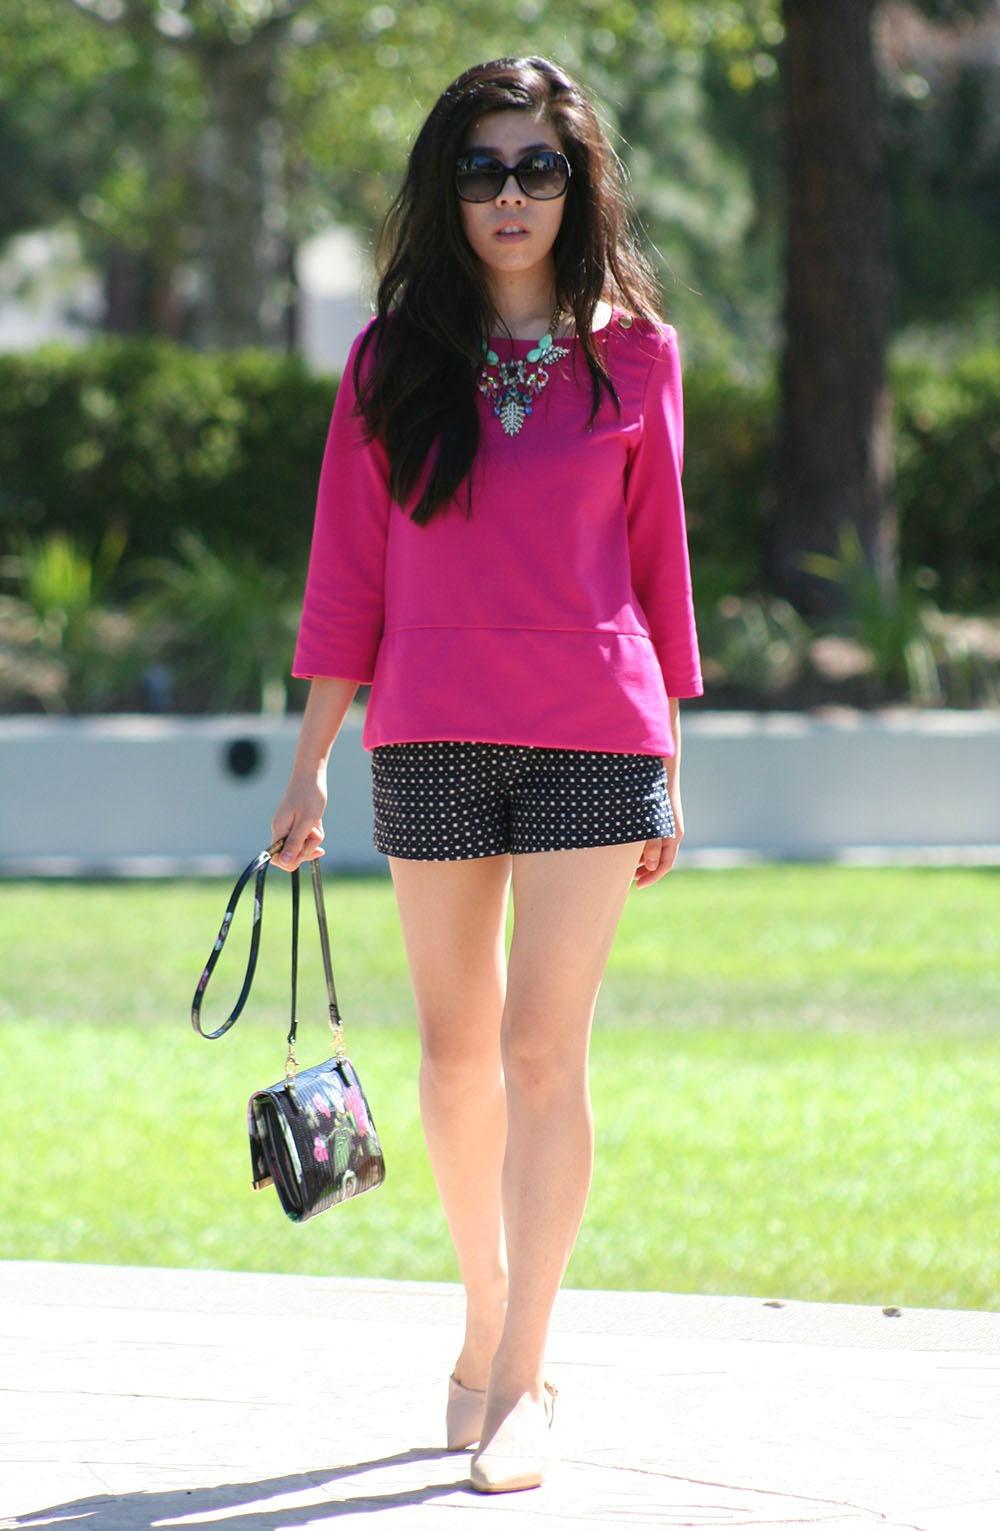 Adrienne Nguyen_Invcitus_petite girl fashion blog_girly fashion